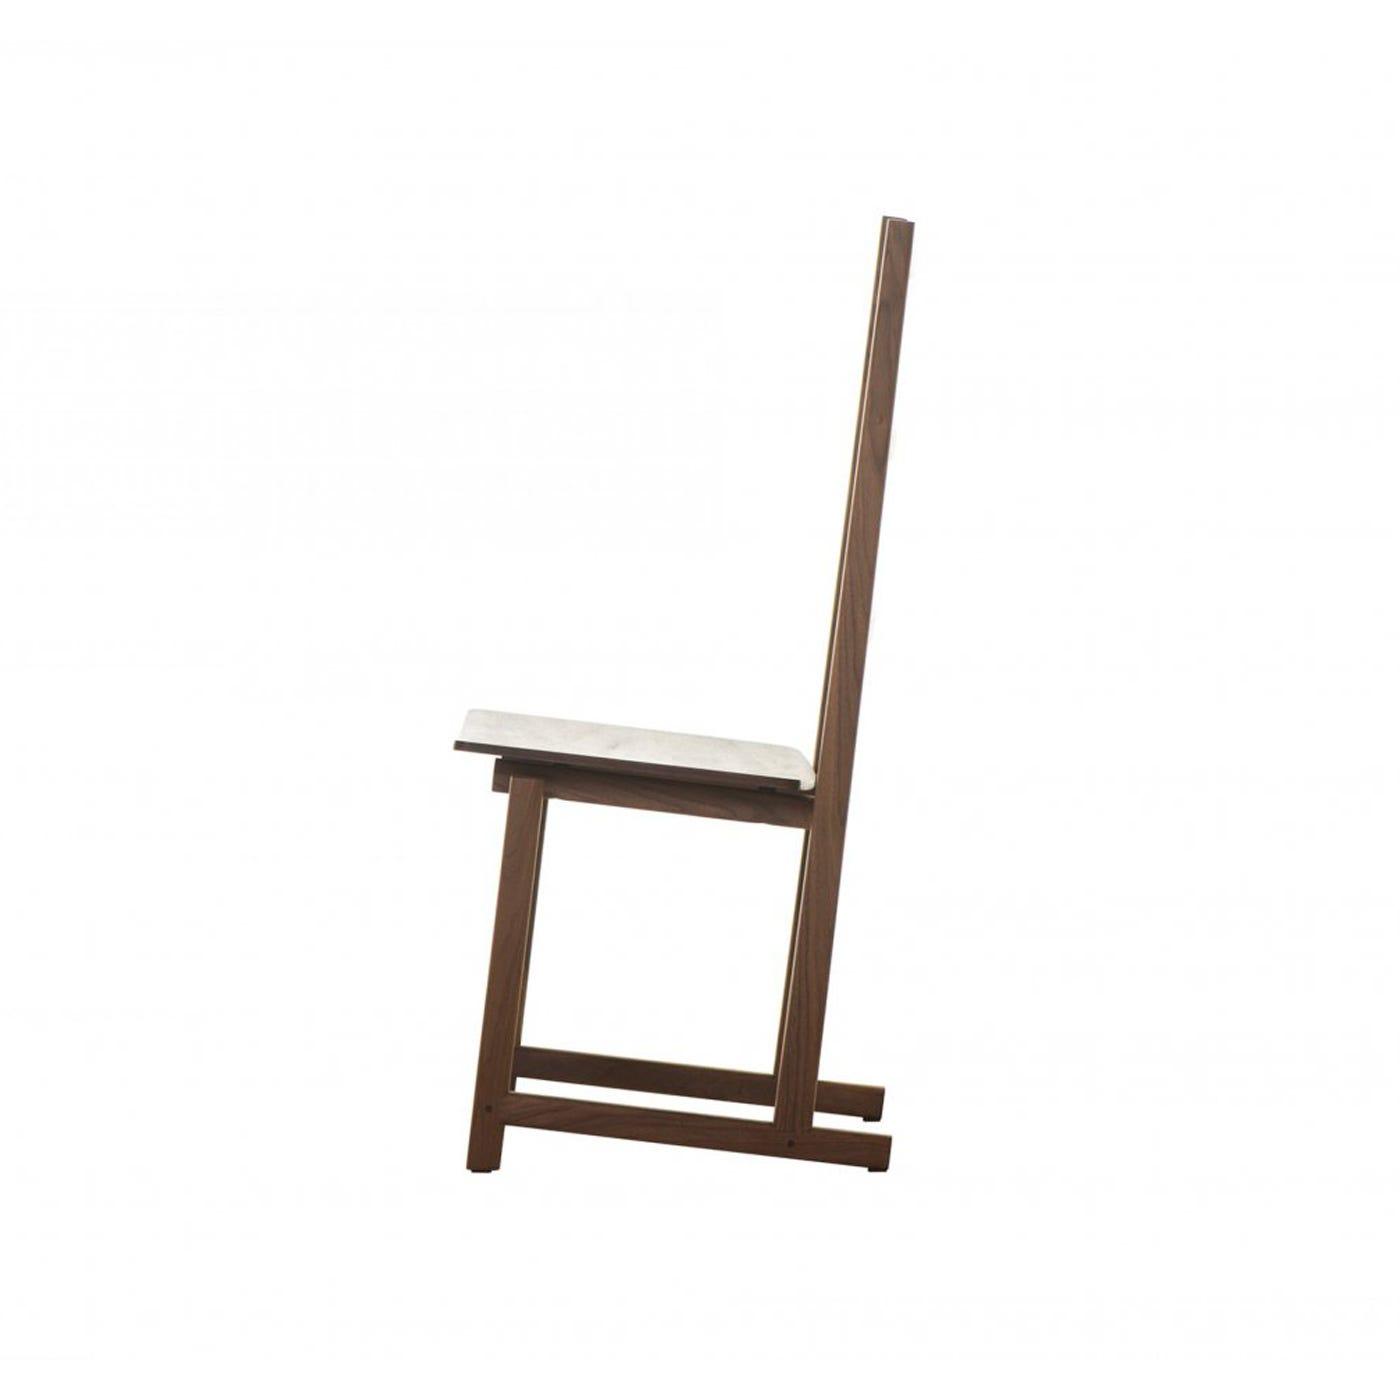 Shaker Dining Chair in Walnut